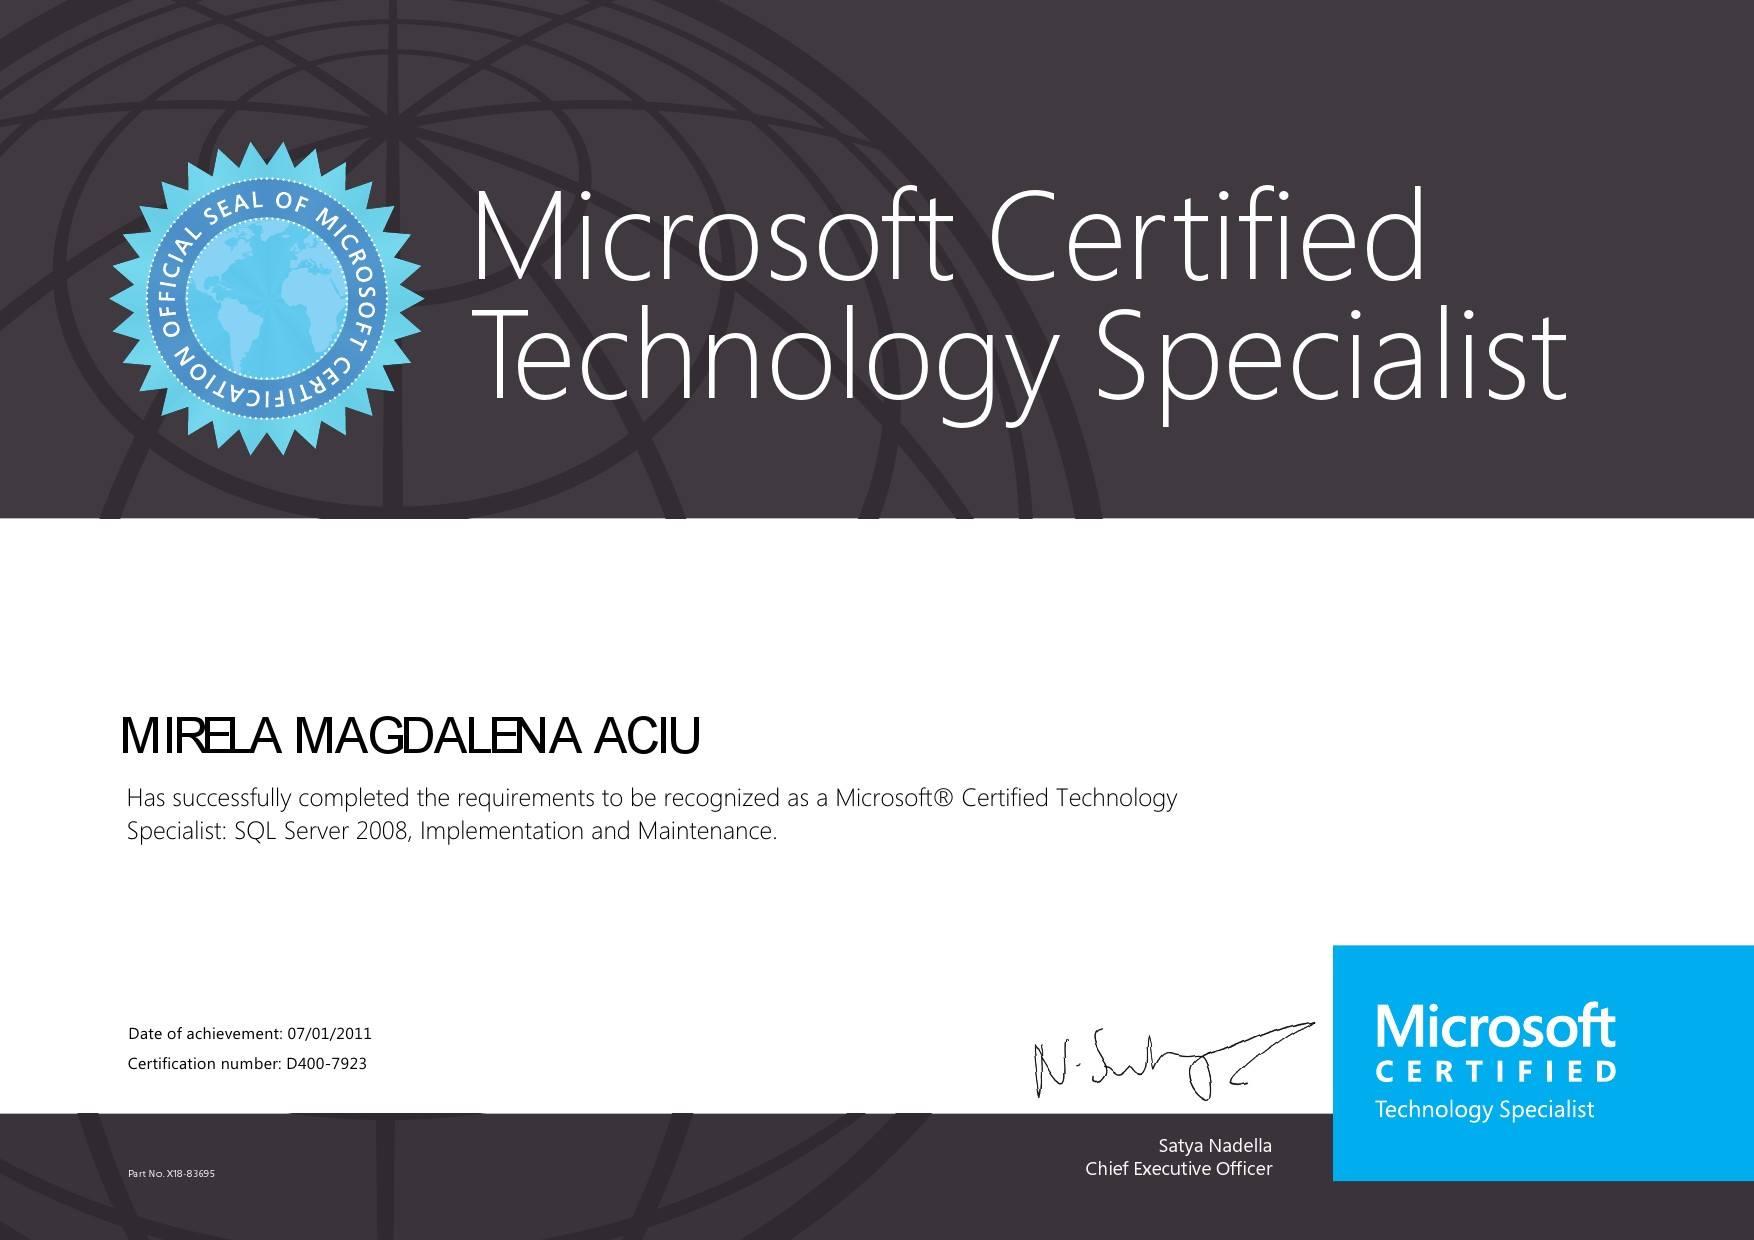 MIRELA MAGDALENA ACIU - Specialist: SQL Server 2008, Implementation and Maintenance